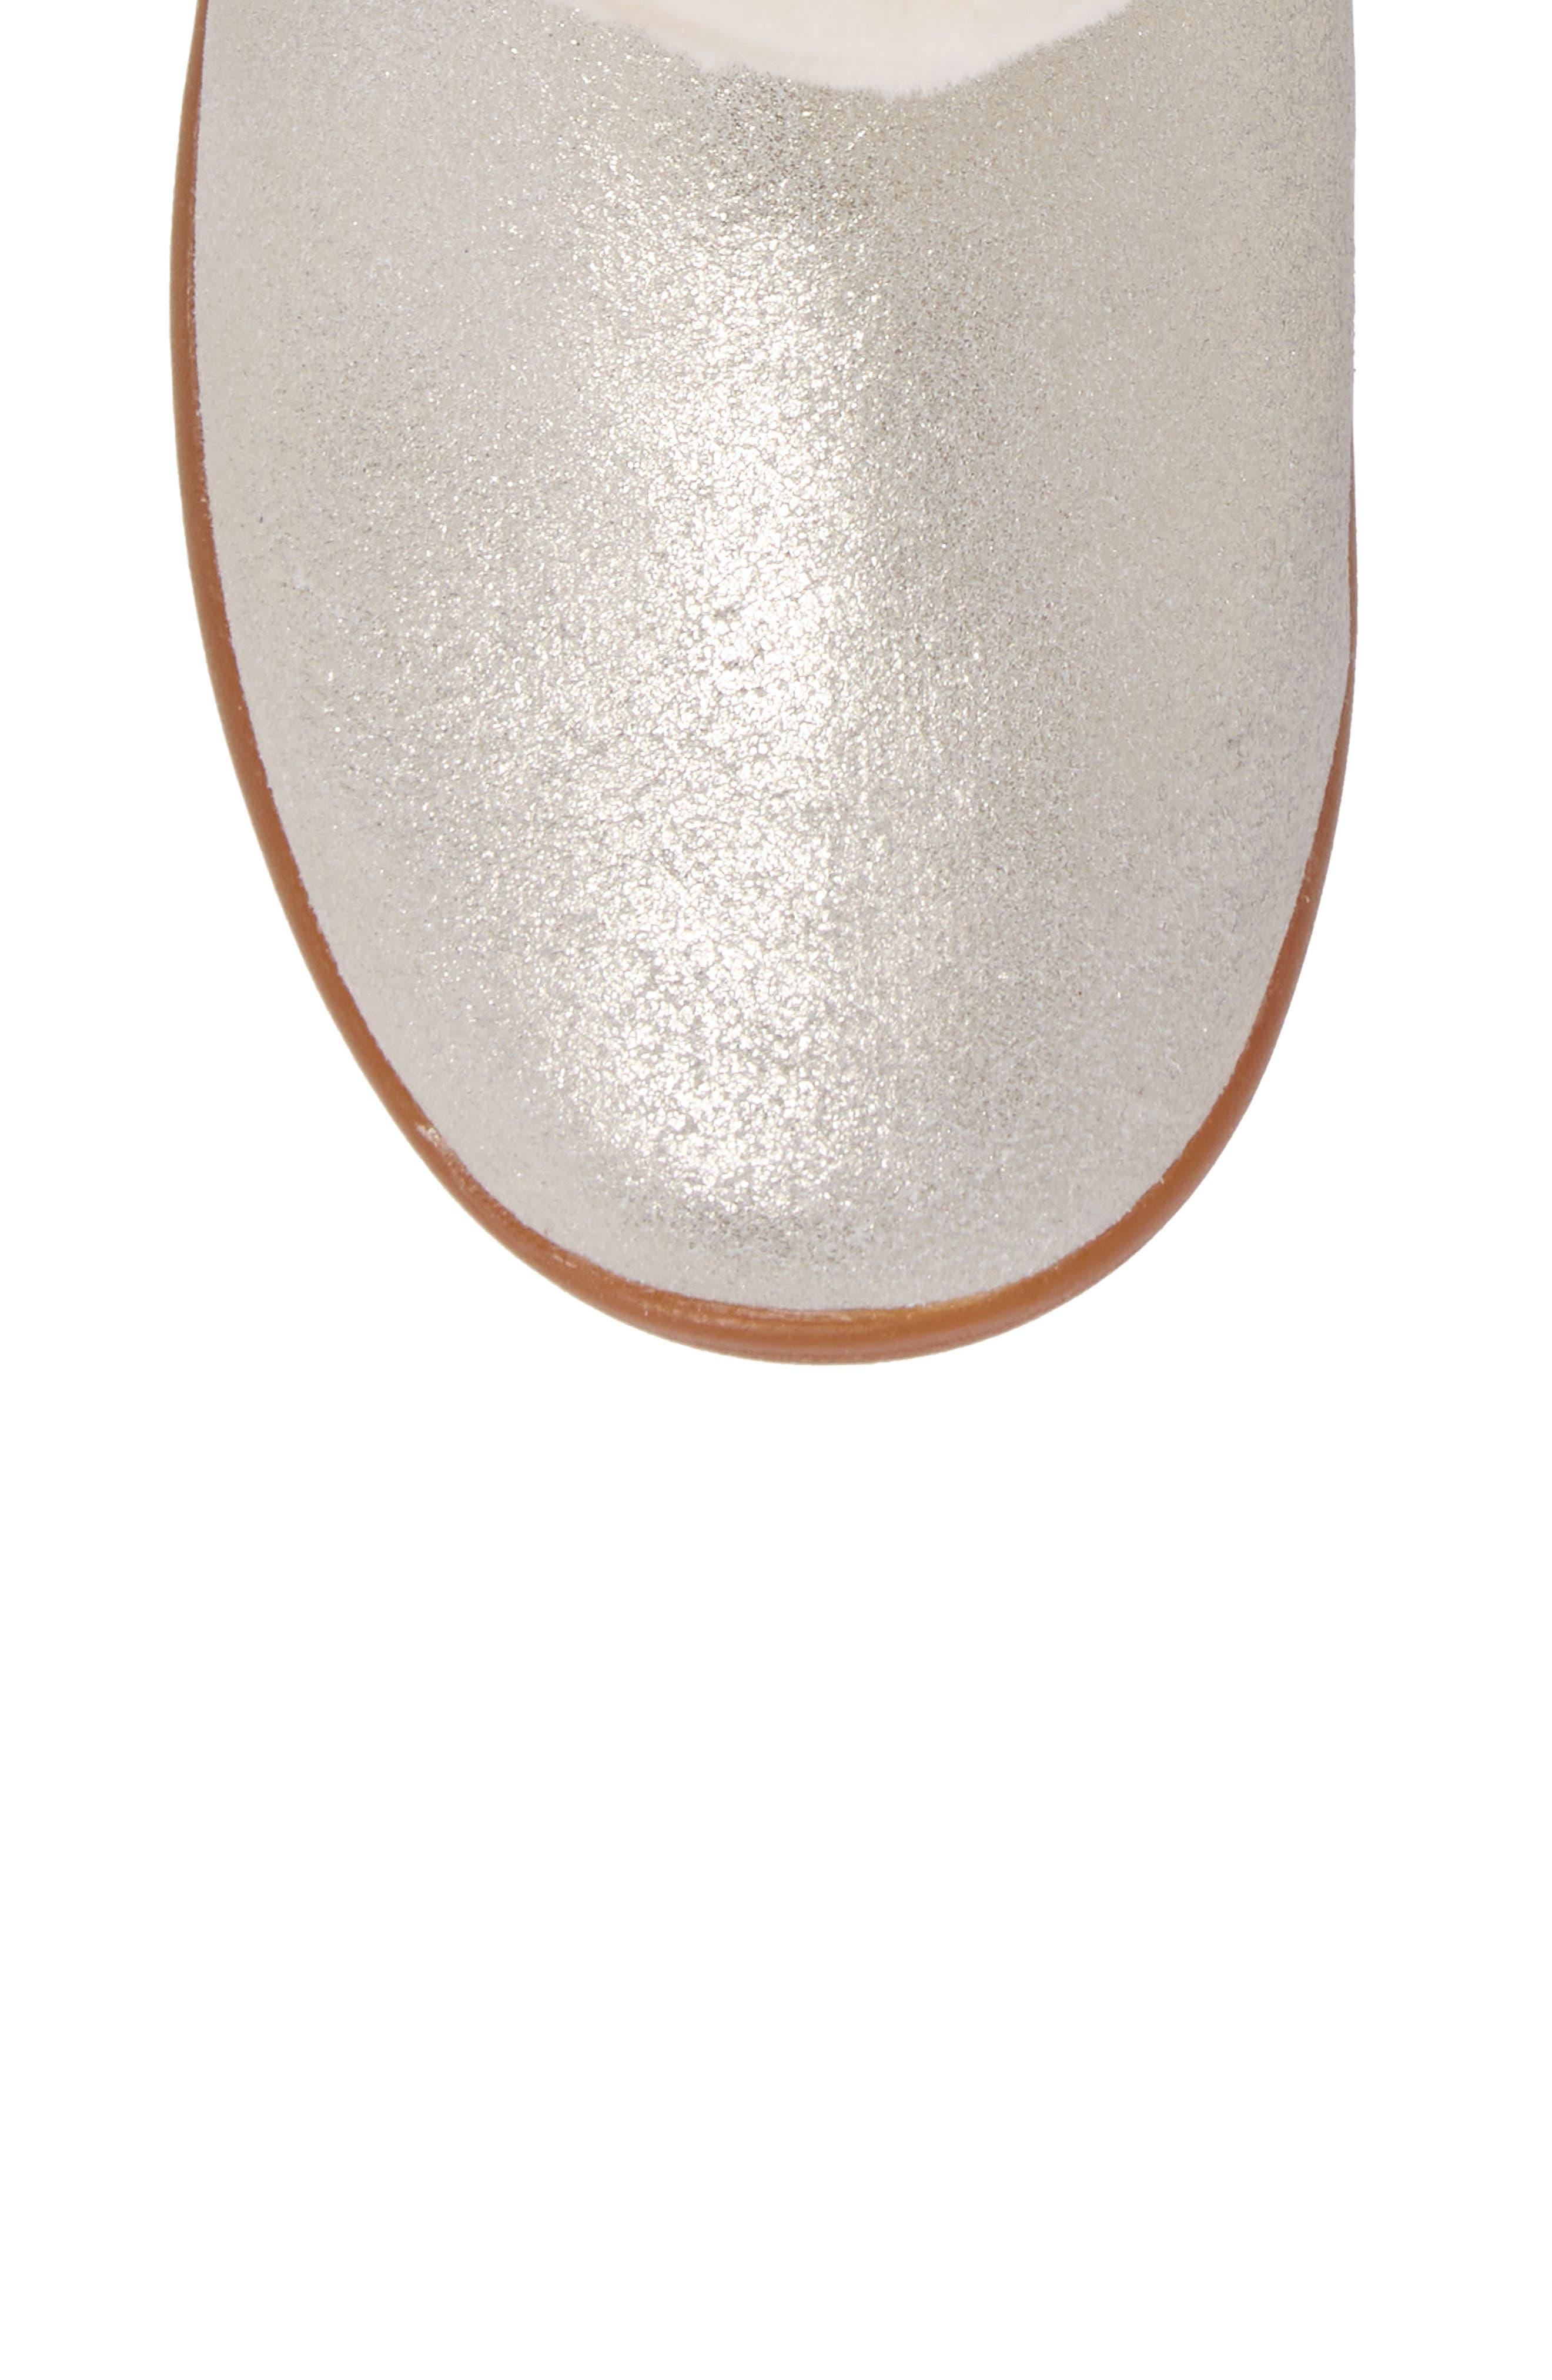 UGG<SUP>®</SUP>, Jorie II Genuine Shearling Metallic Boot, Alternate thumbnail 5, color, METALLIC GOLD